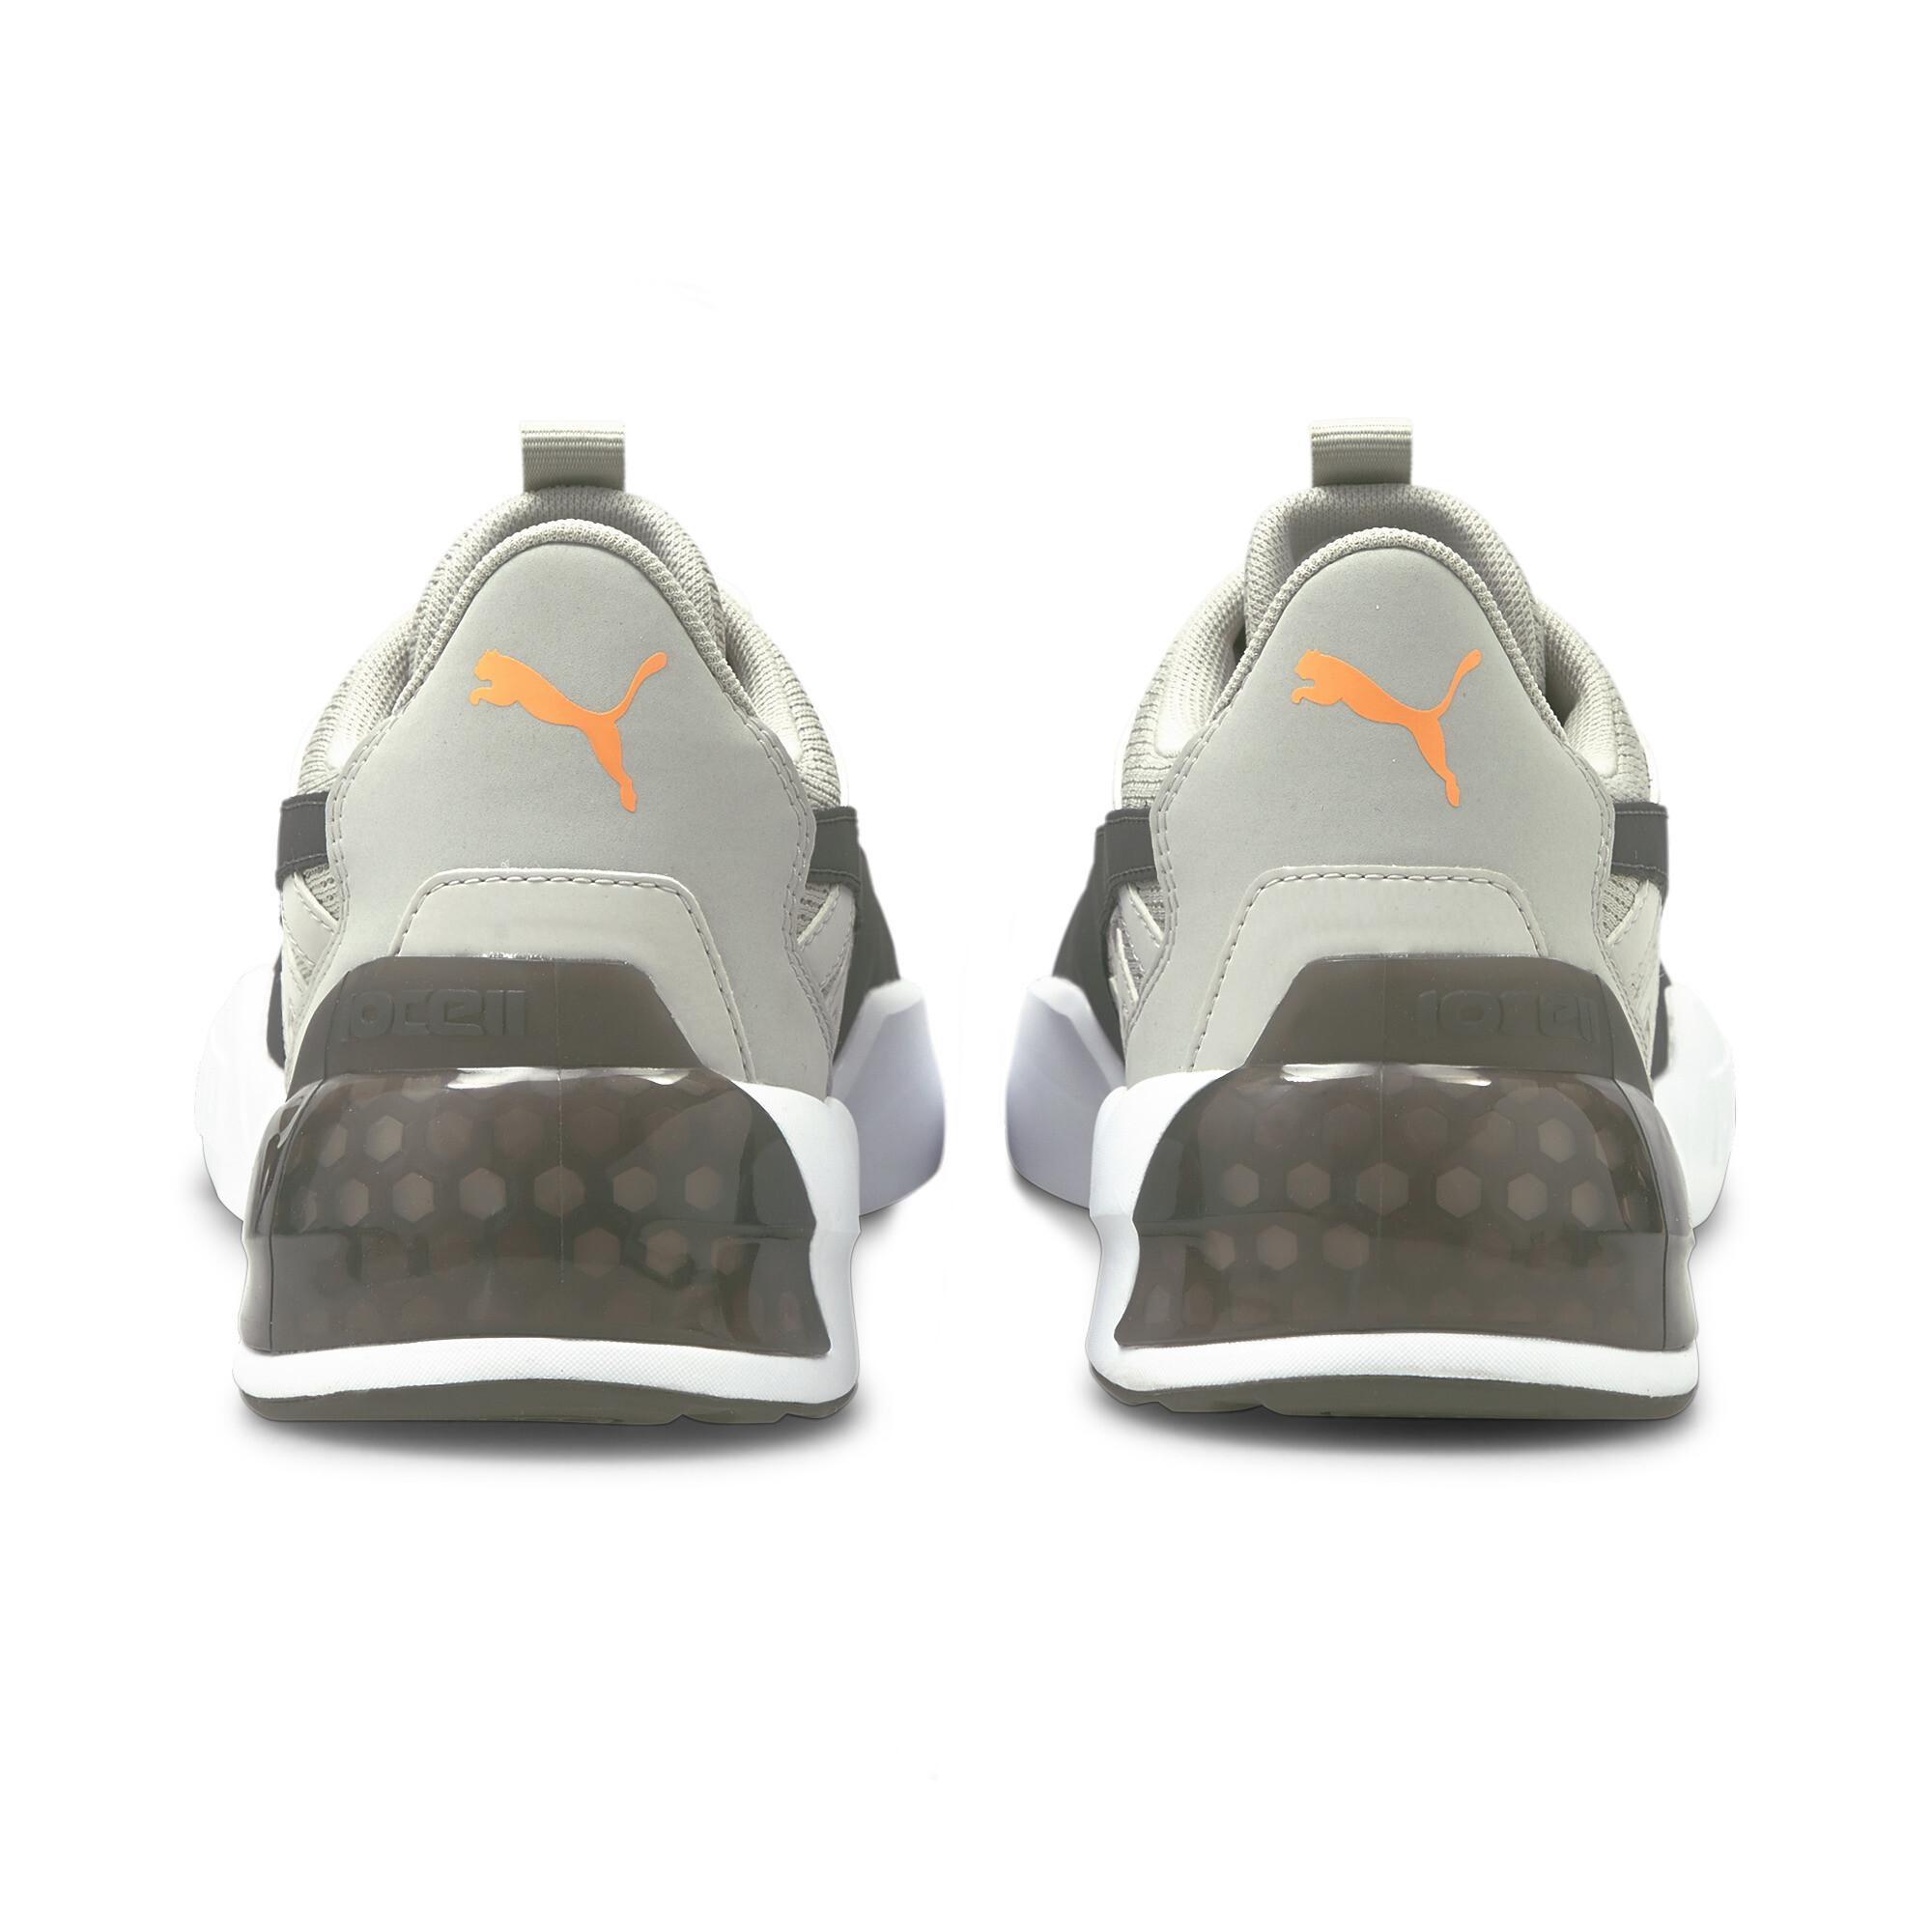 thumbnail 10 - PUMA Men's CELL Pharos Training Shoes